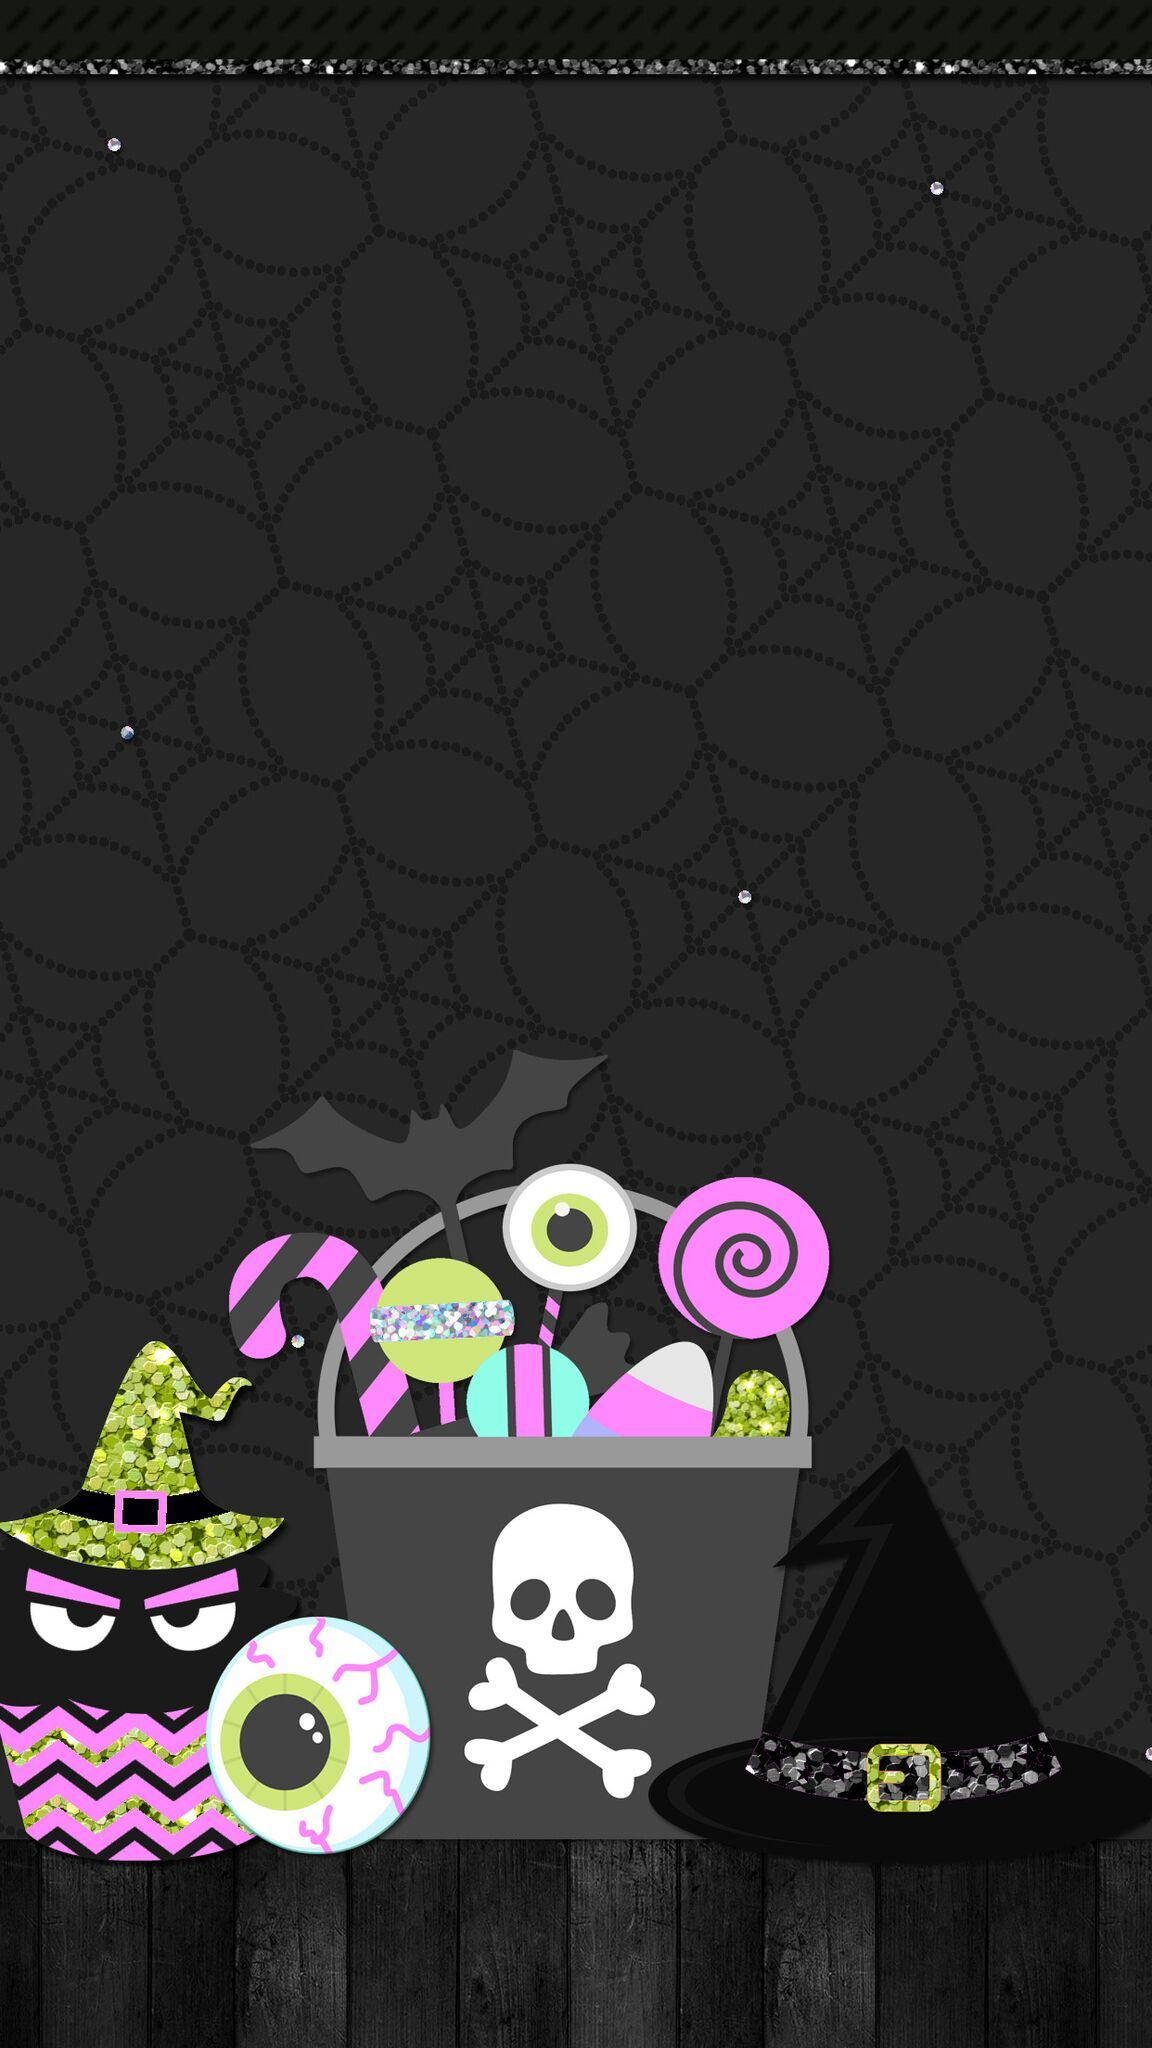 Dropbox Creepy cute theme walls Halloween wallpaper